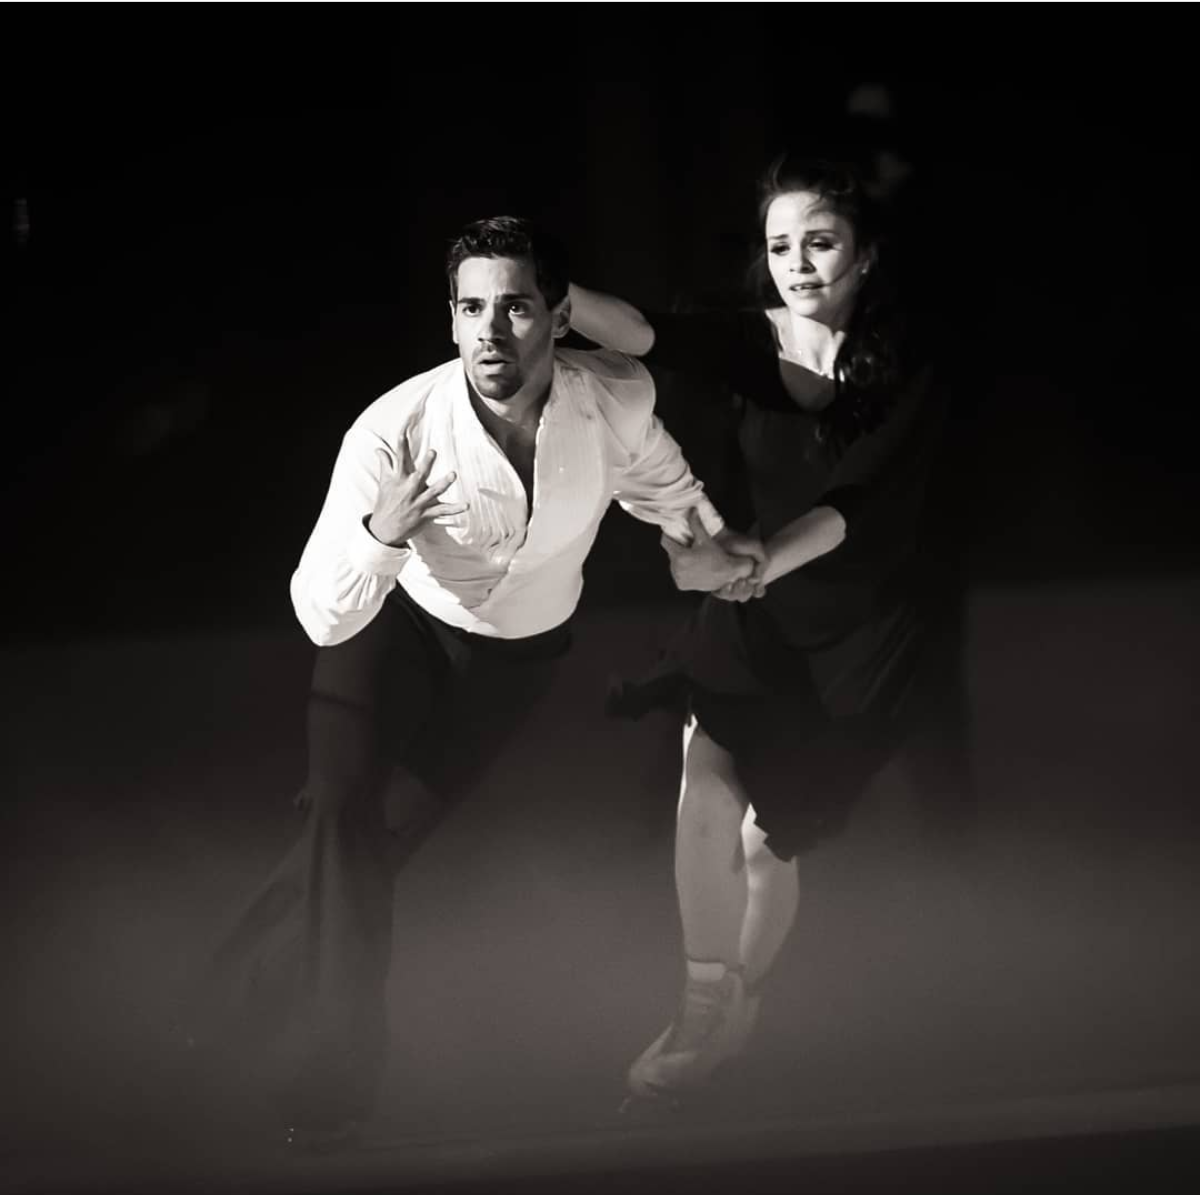 Анна Капеллини - Лука Ланоте / Anna CAPPELLINI - Luca LANOTTE ITA - Страница 10 BsDjG